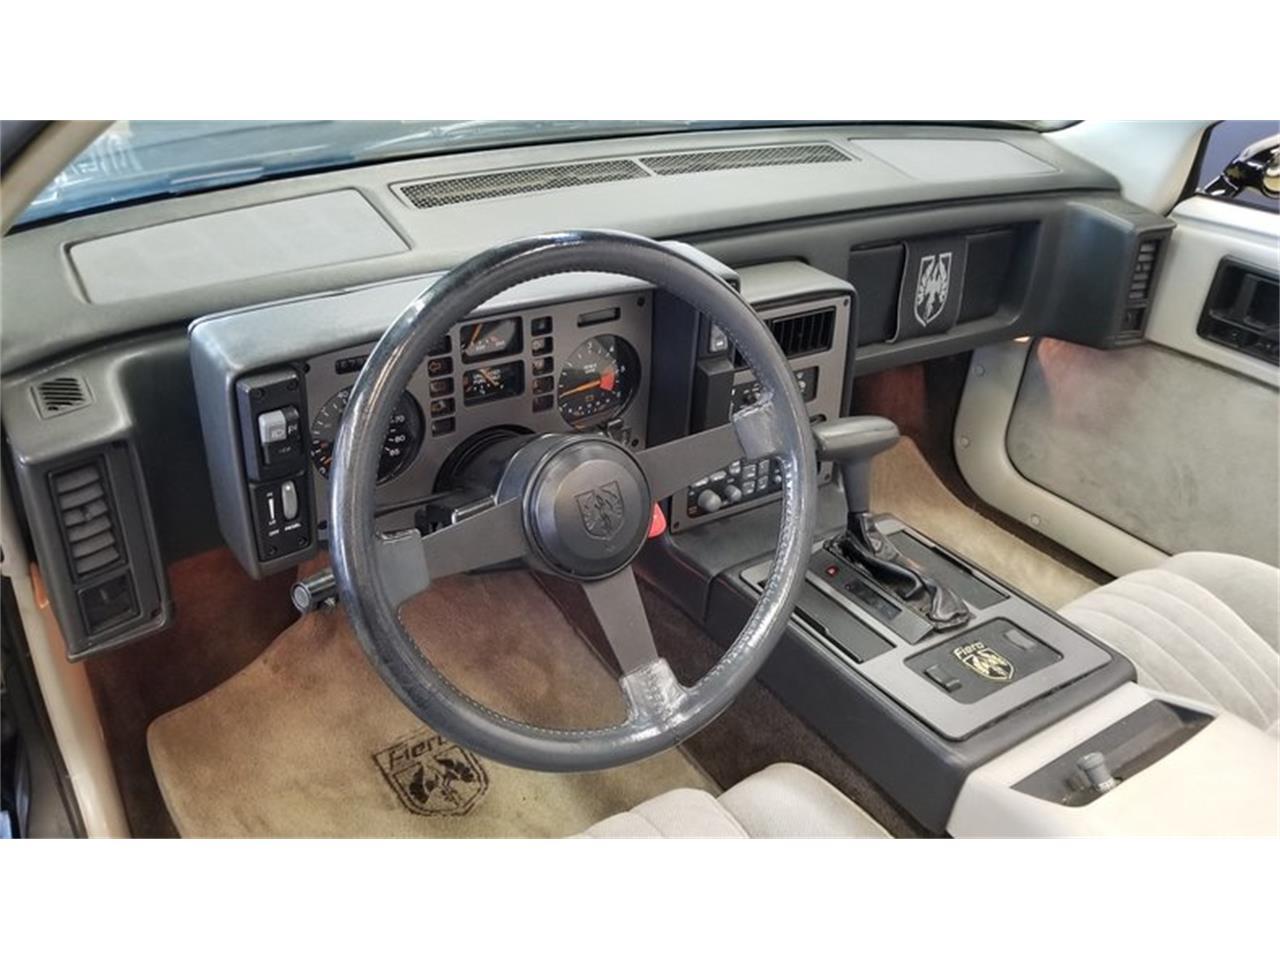 1984 Pontiac Fiero For Sale Cc 1128979 Drivetrain Large Picture Of 84 O74j